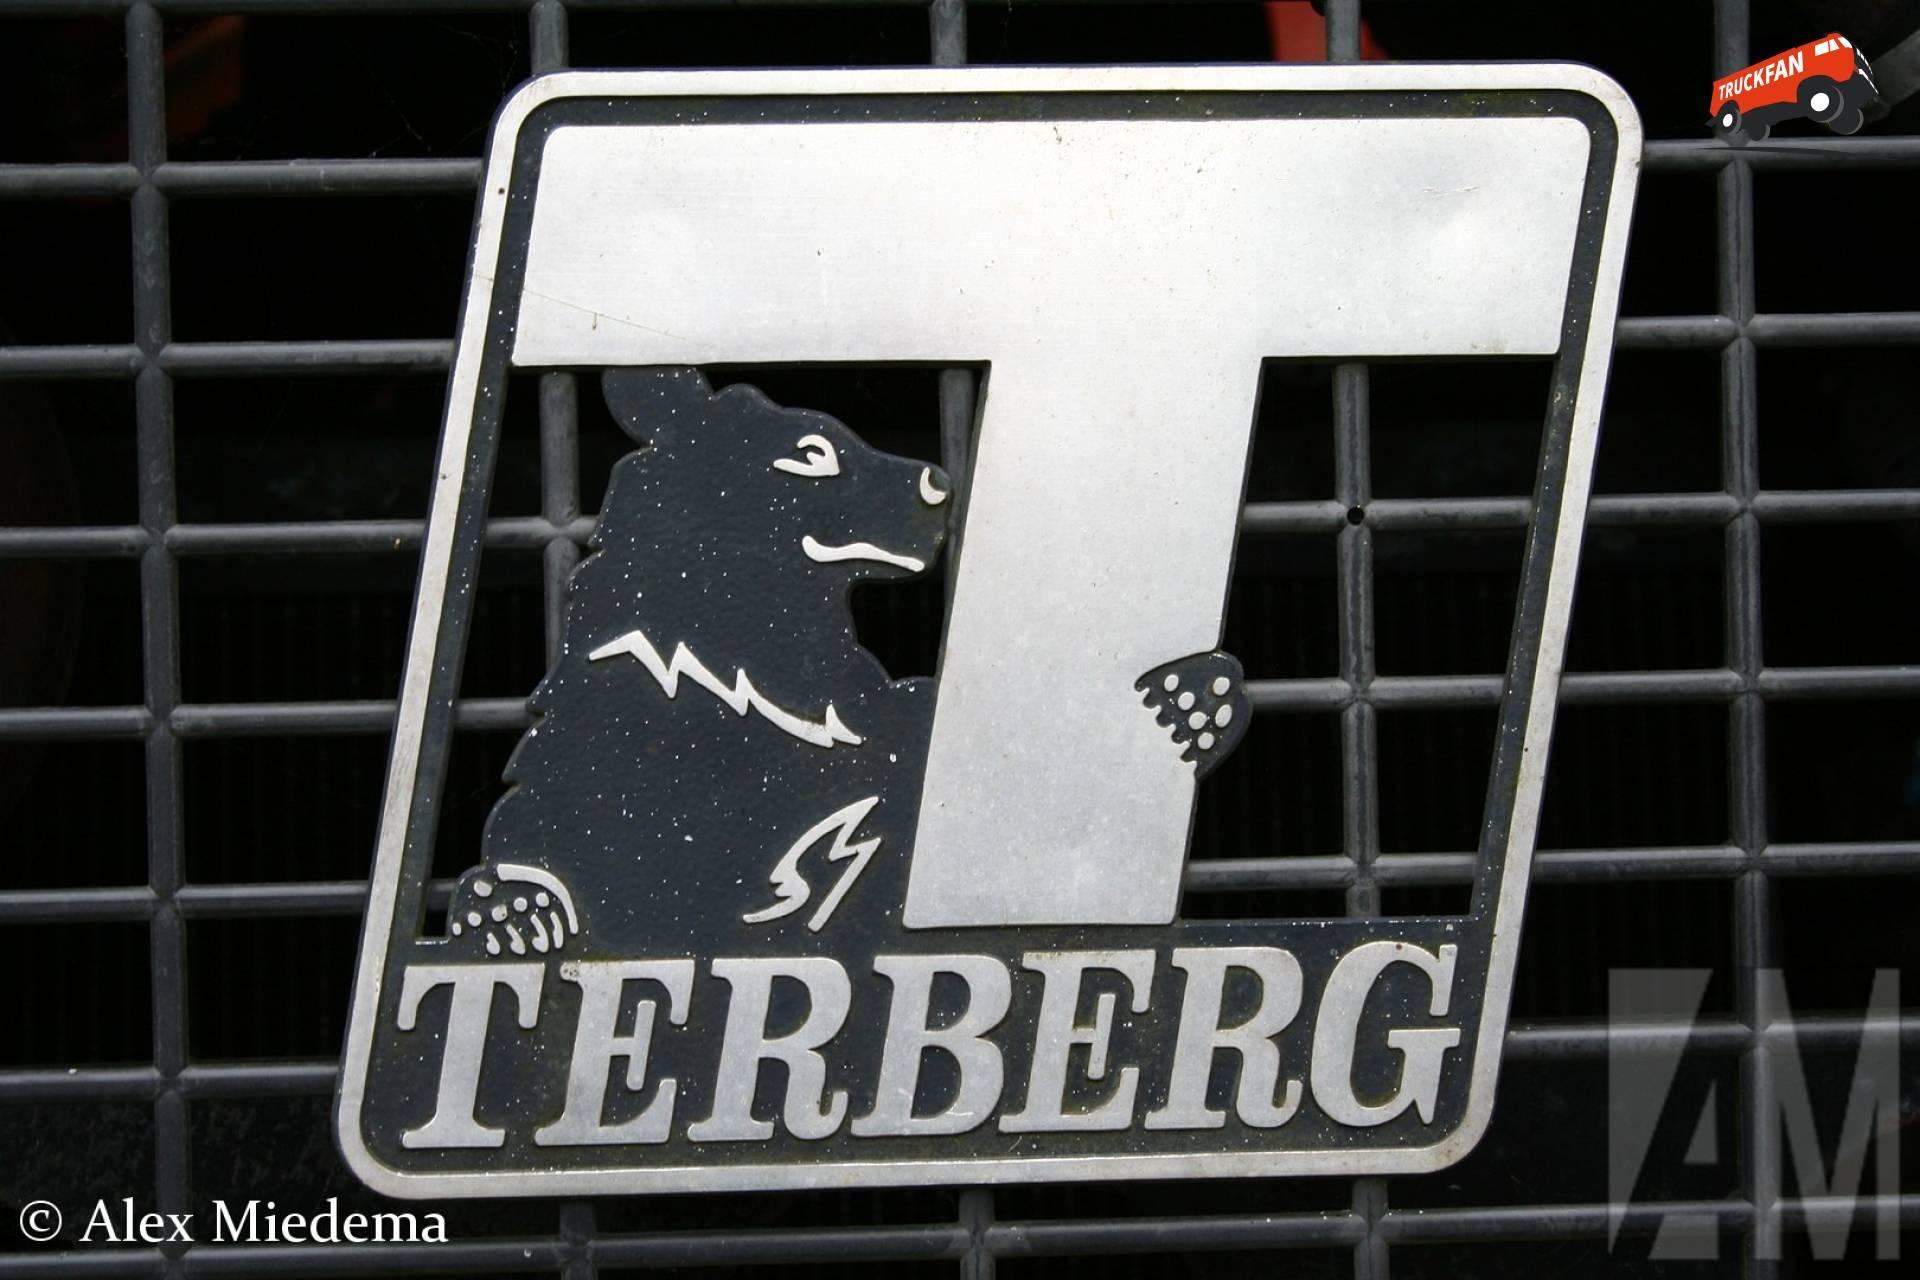 Terberg F-serie